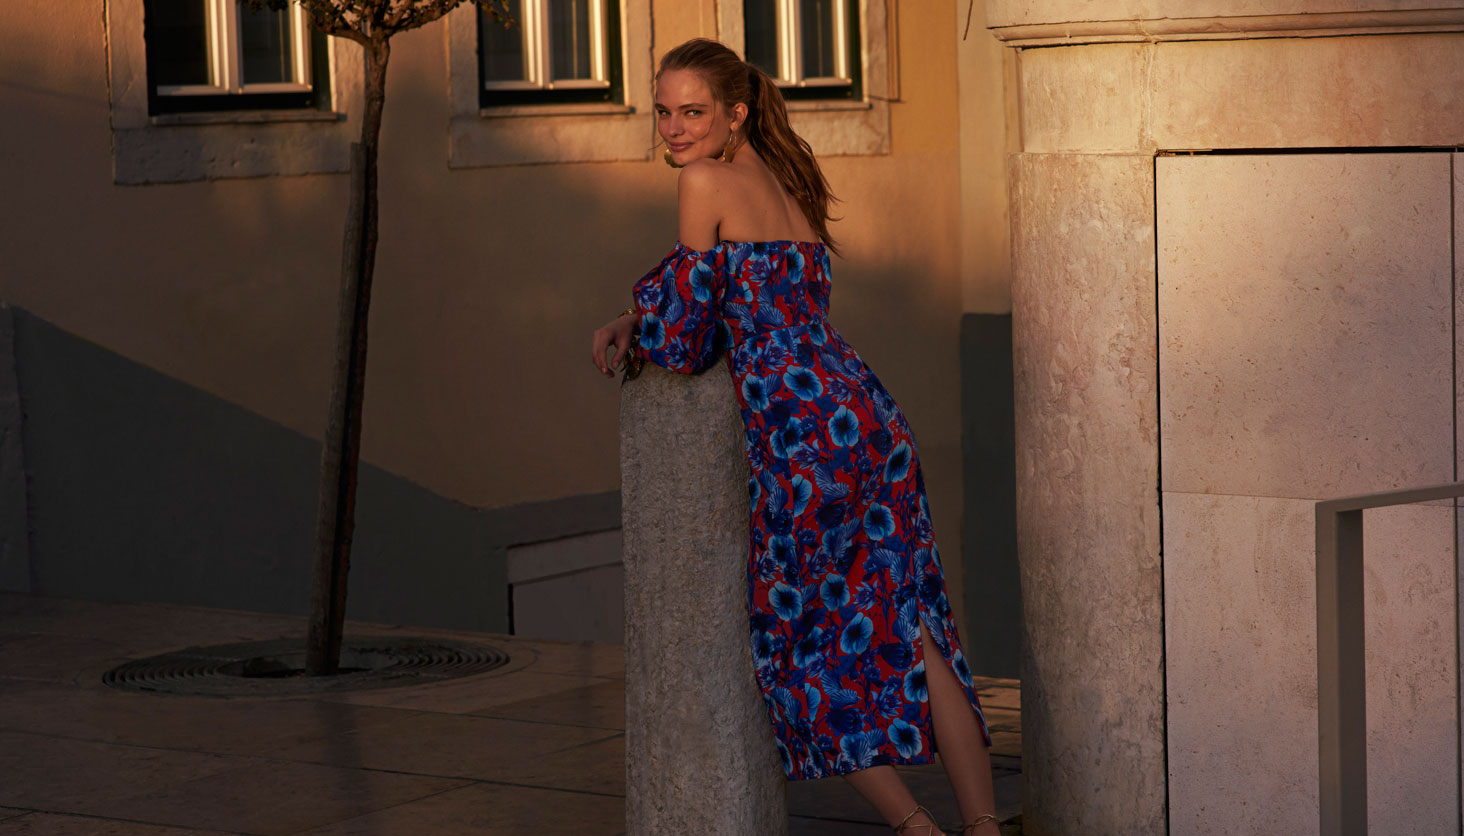 Posing on a Shadow Evening